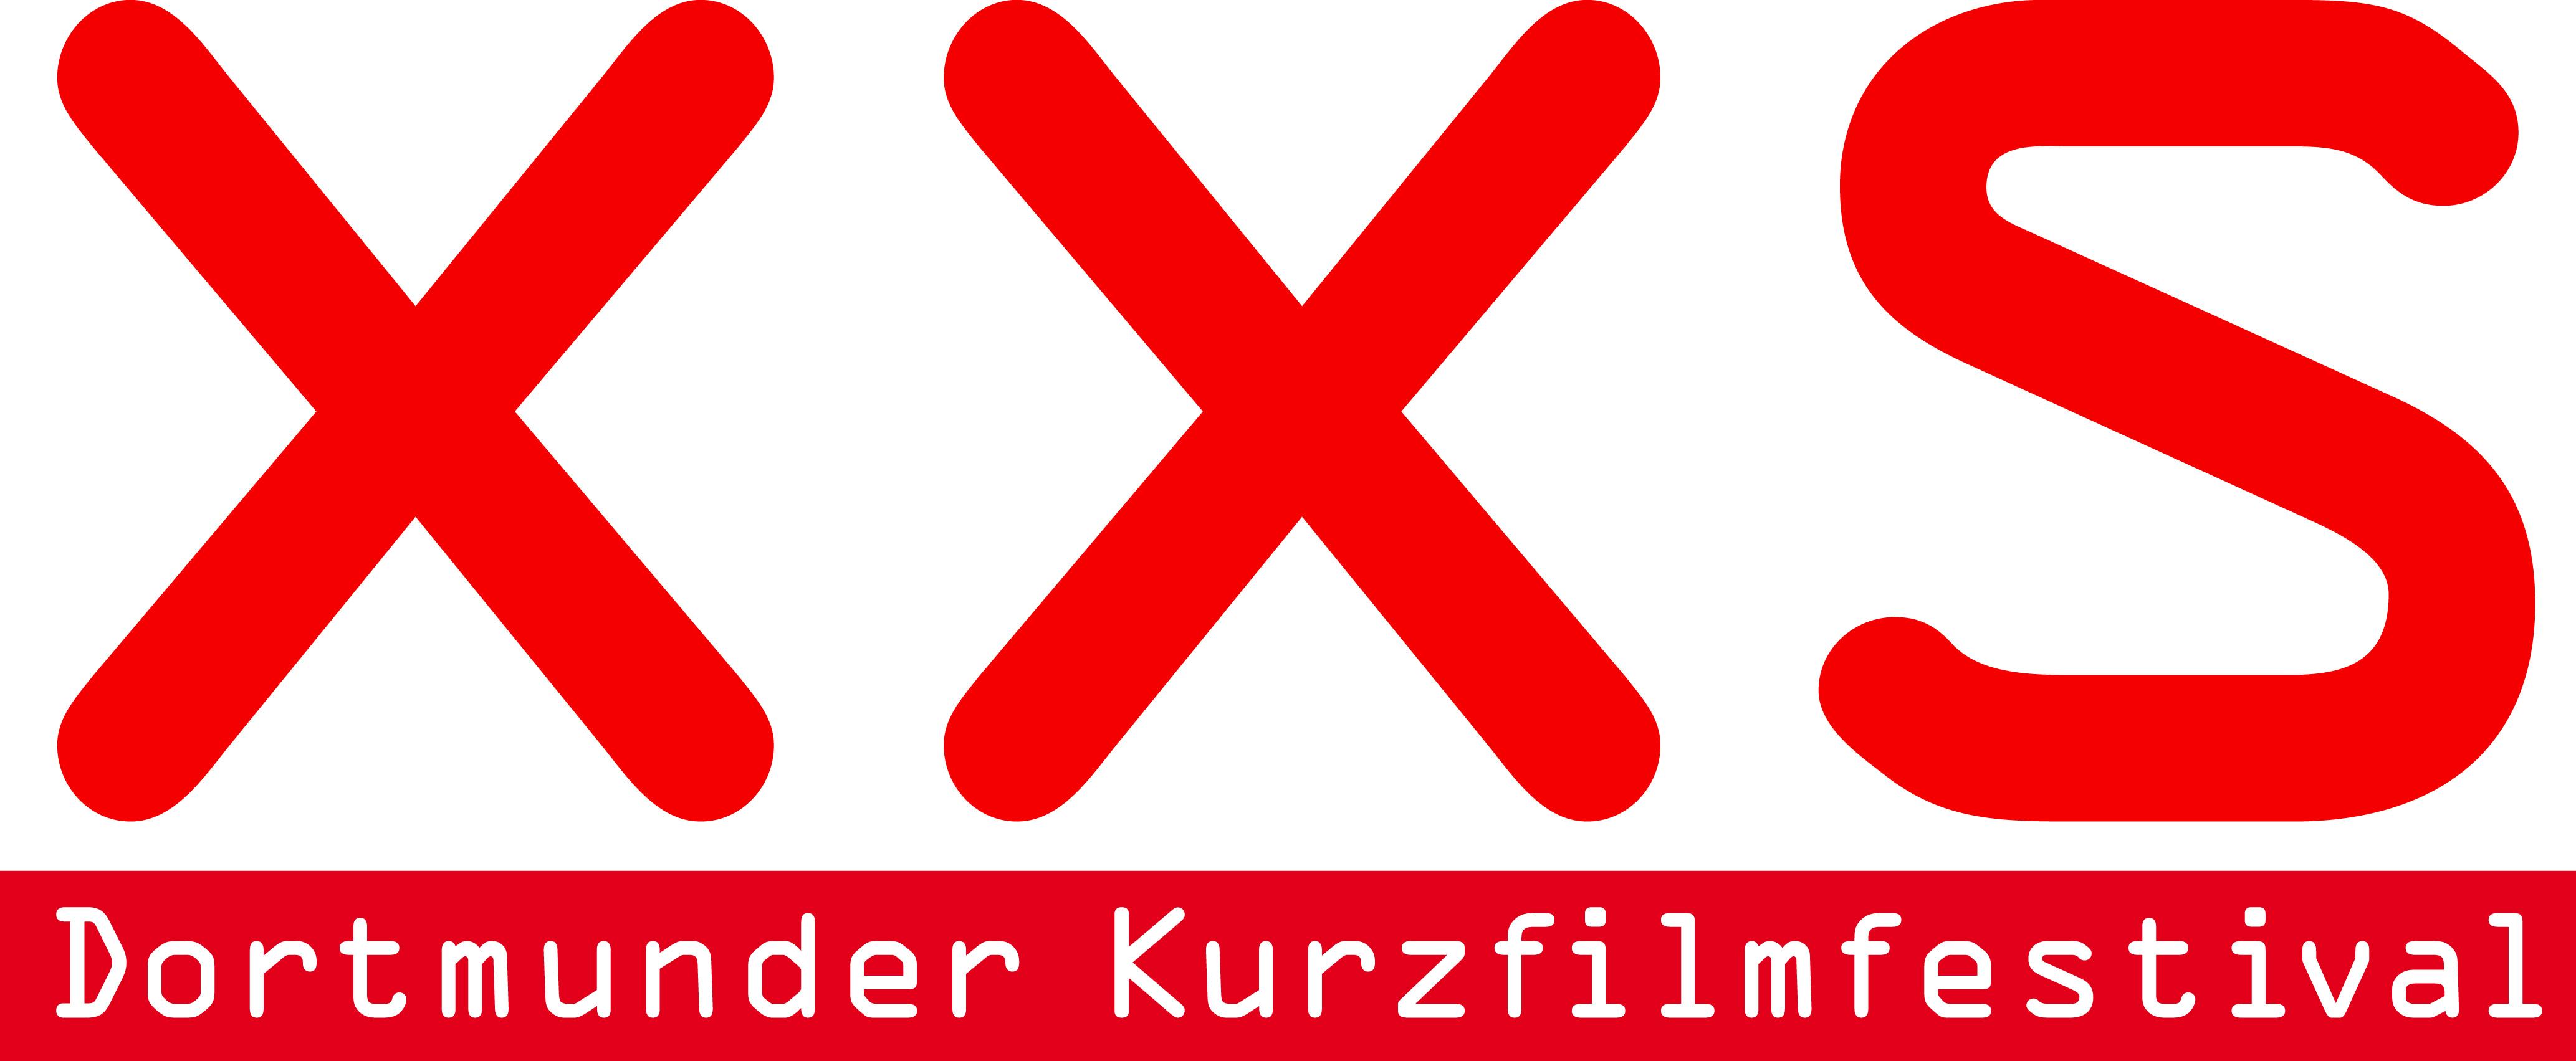 File Xxs Logo 2011 Jpg Wikimedia Commons